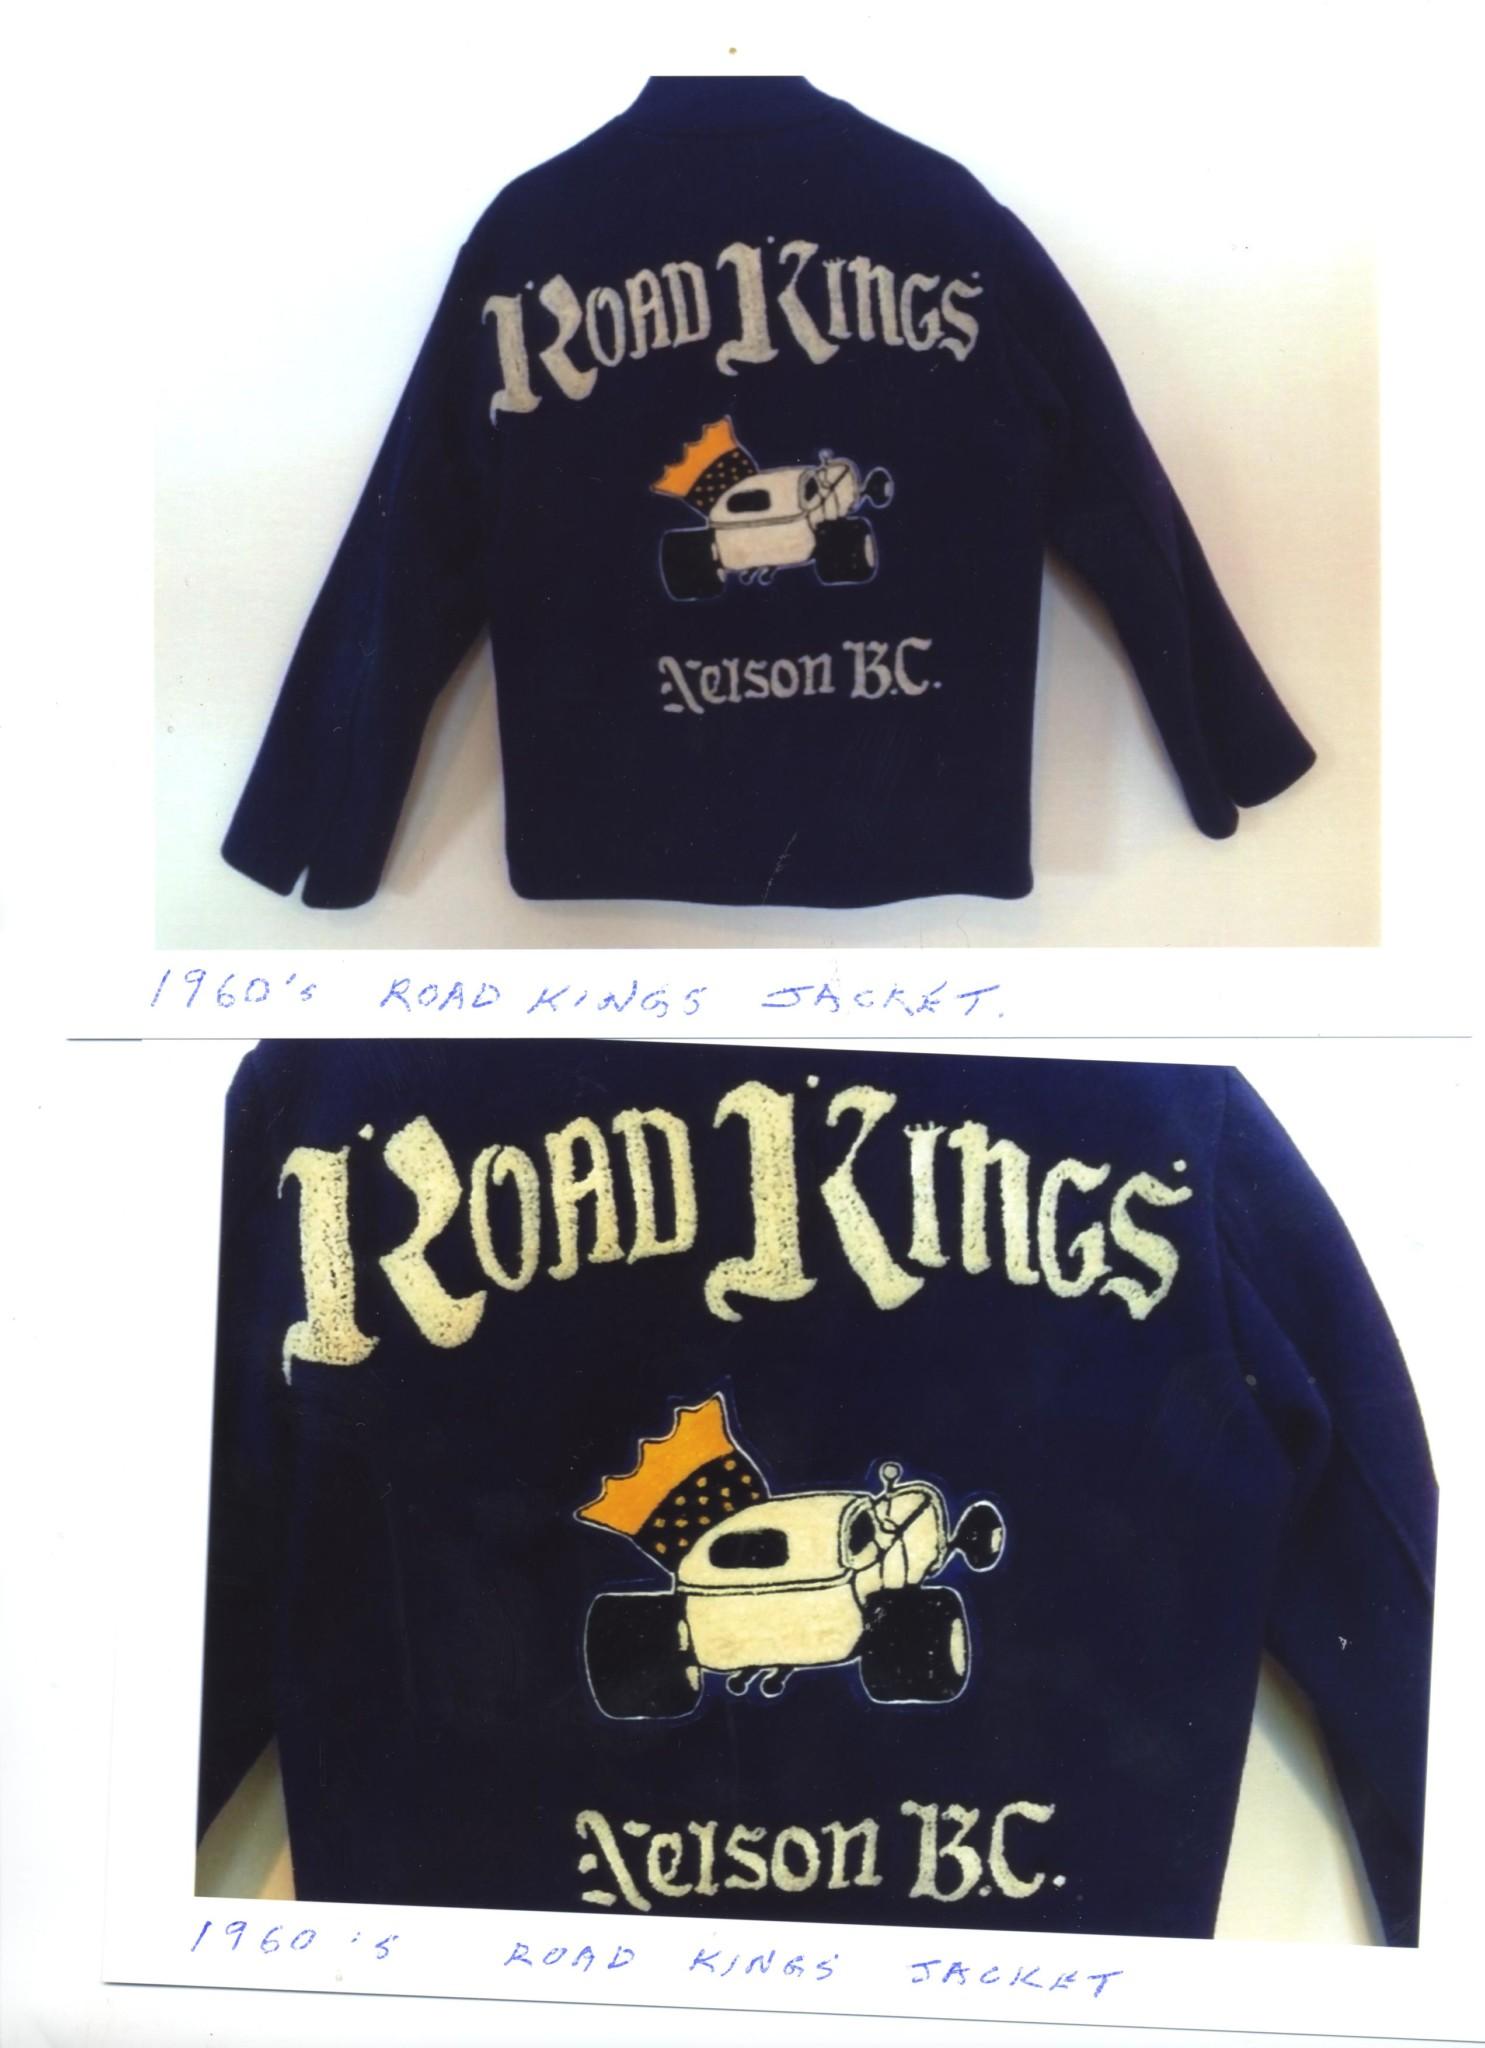 History Nelson Road Kings